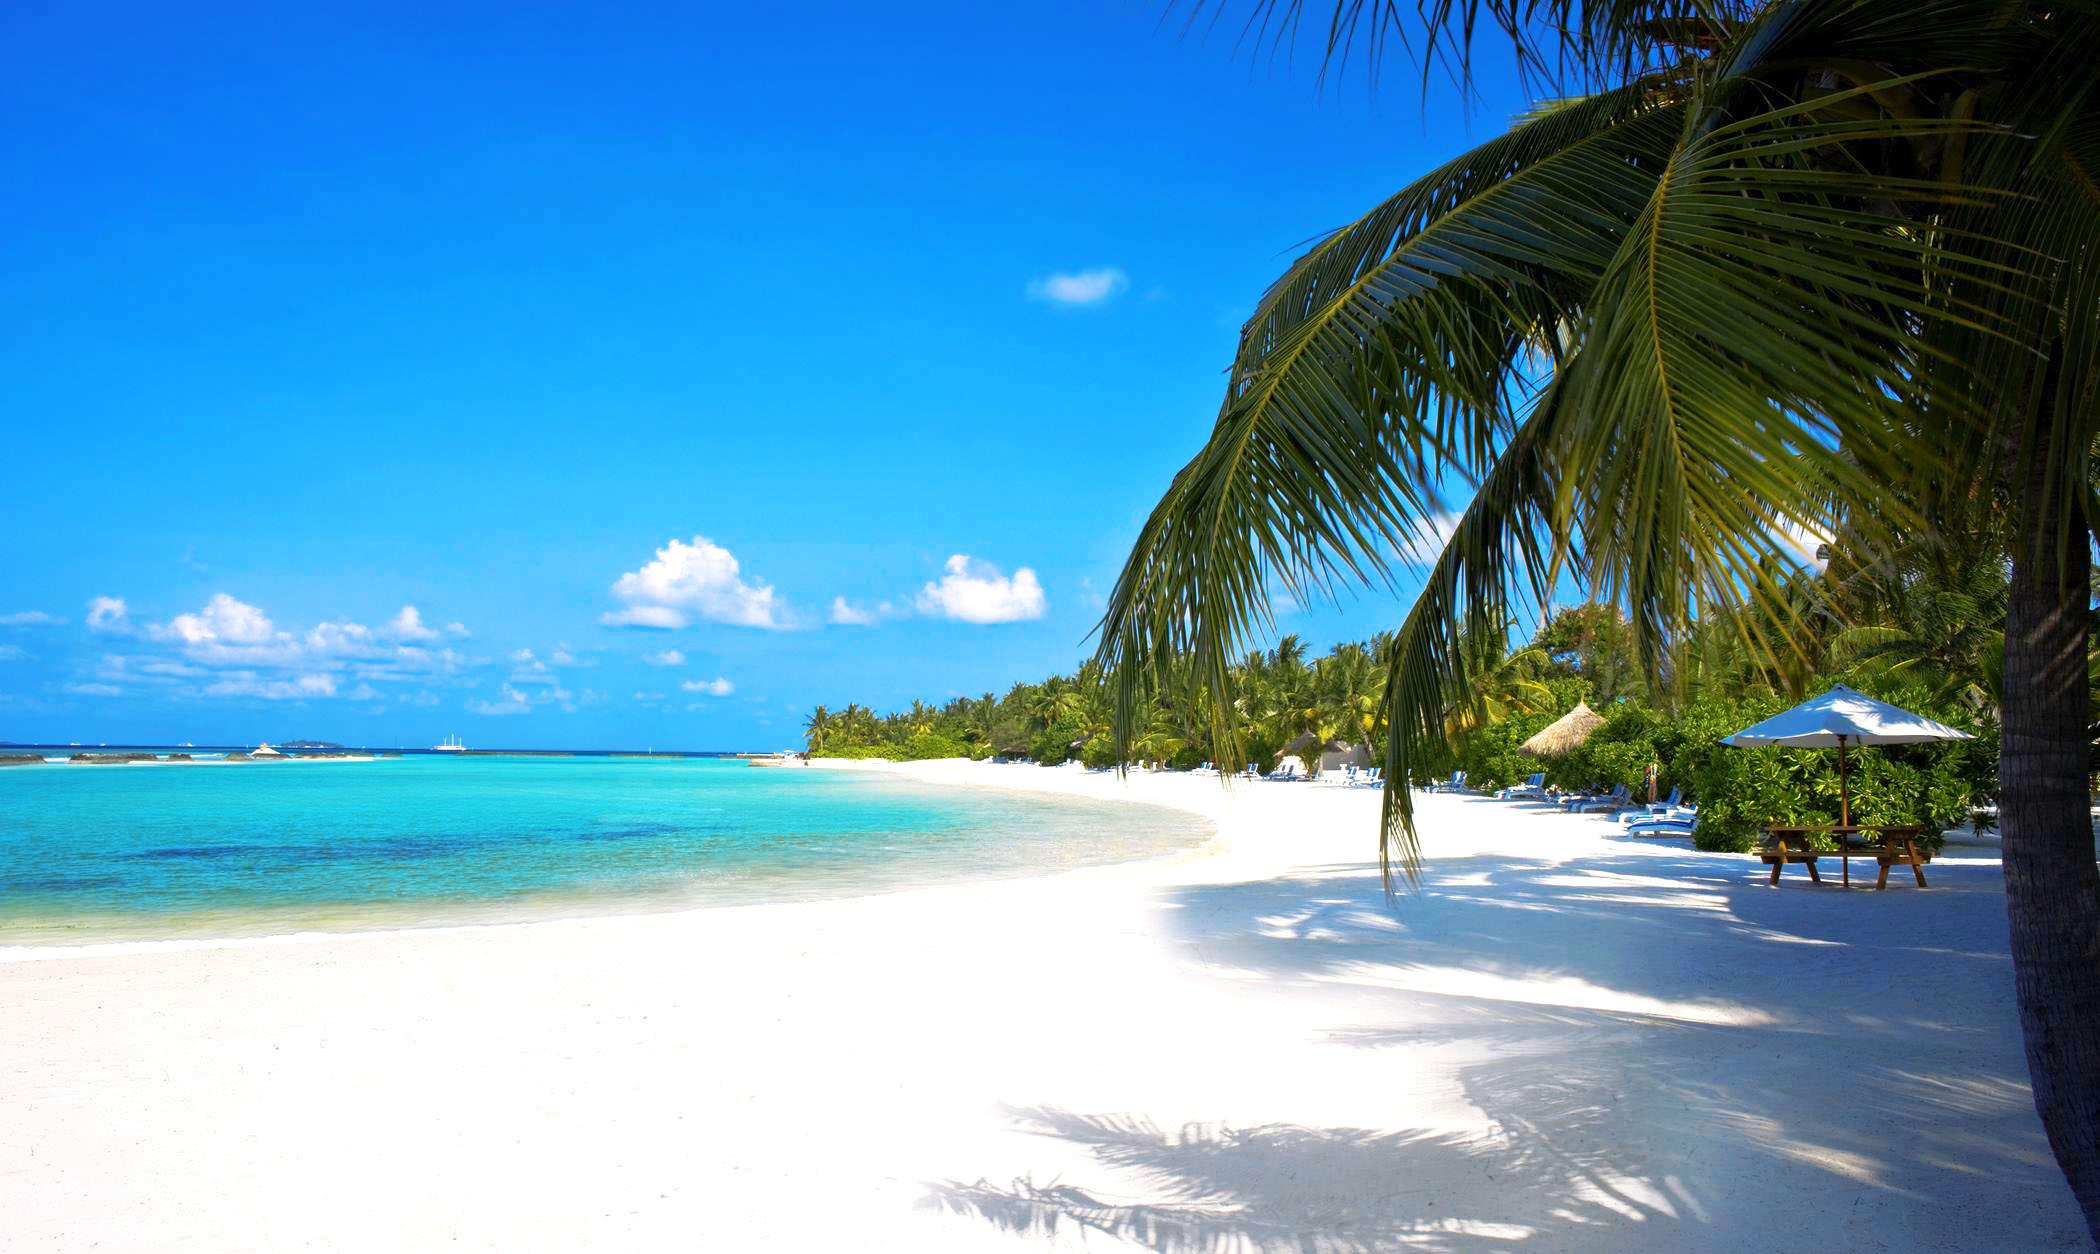 fond-ecran-hd-paysage-plage-tropicale-sable-blanc-palmier-mer-turquoise-wallpaper-beach-picture-image-2.jpg